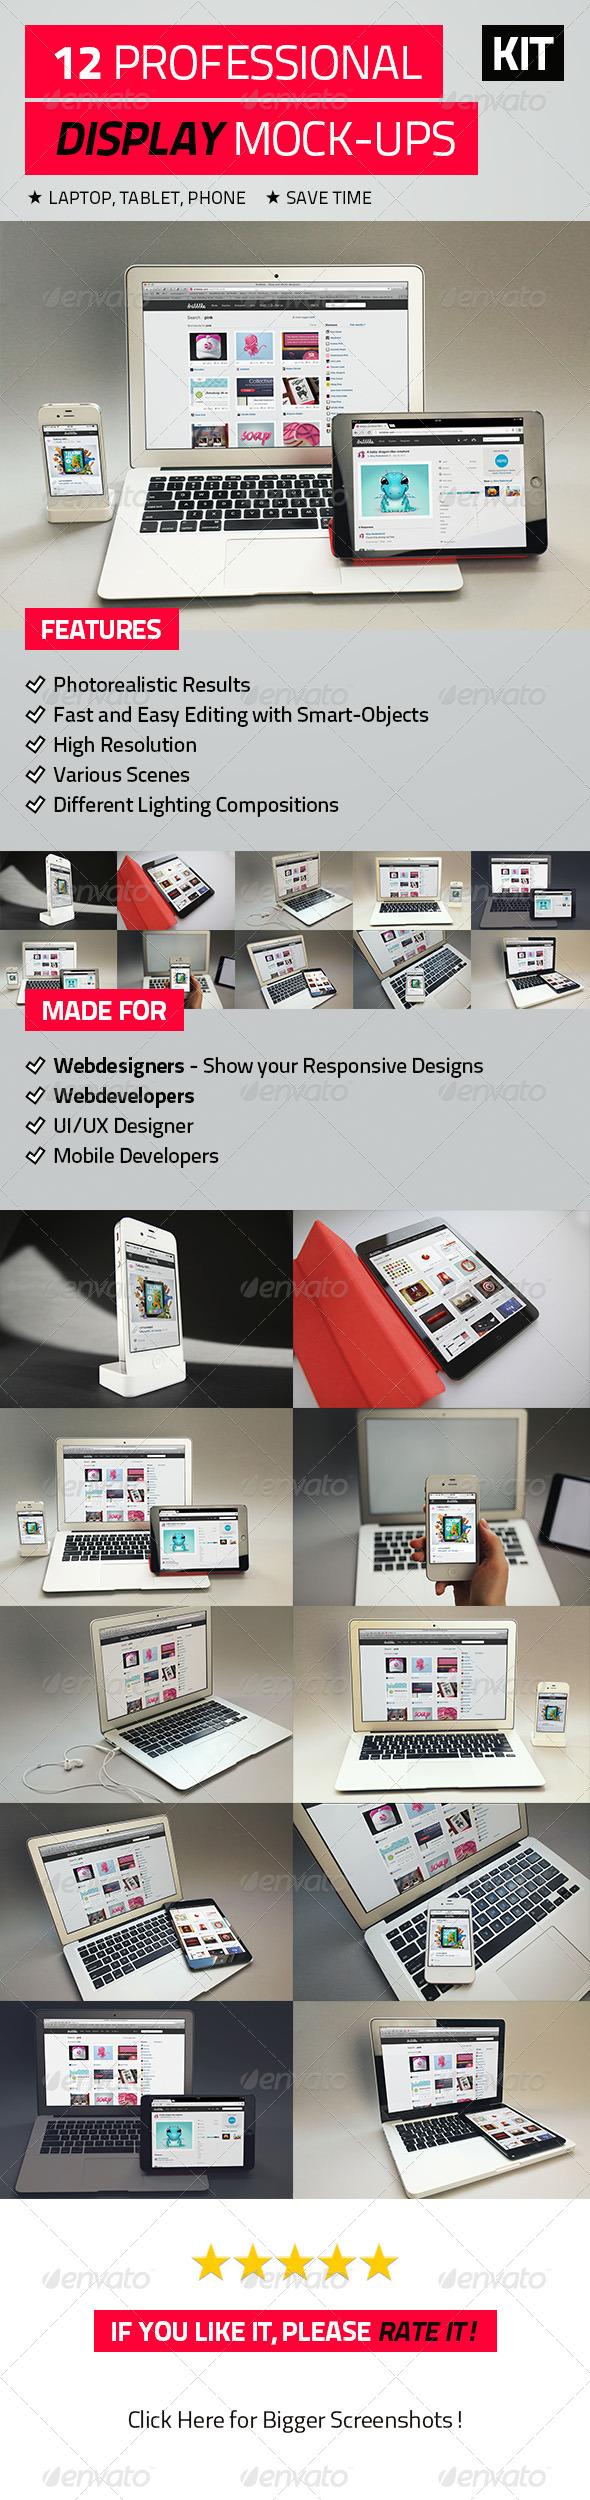 12 Professional Display Mock-Ups